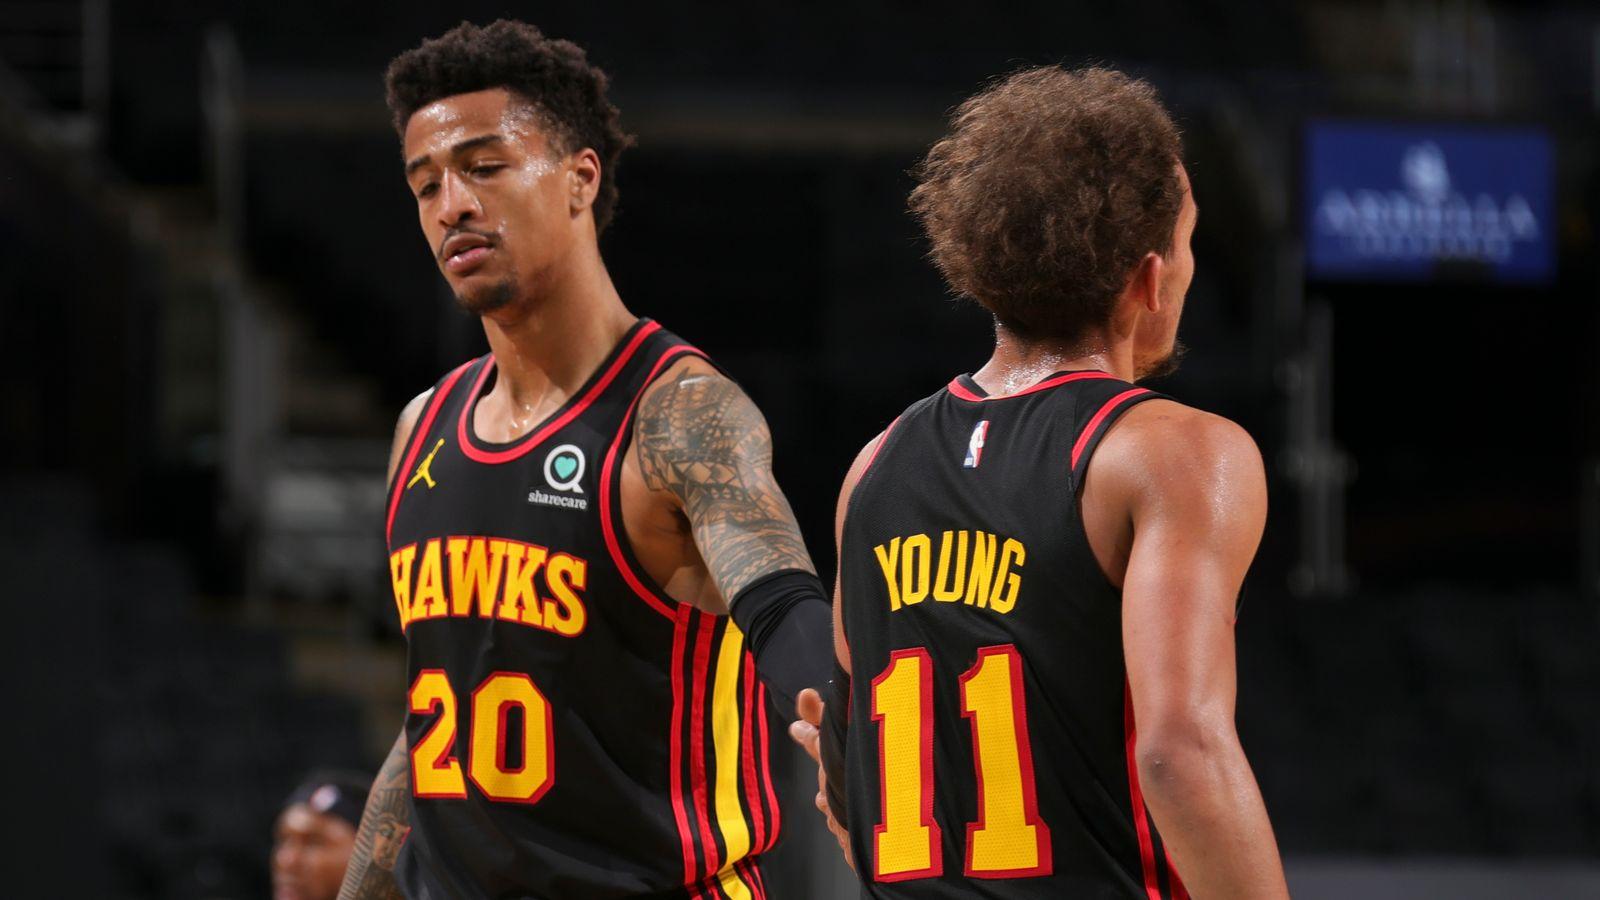 Hawks flying under new head